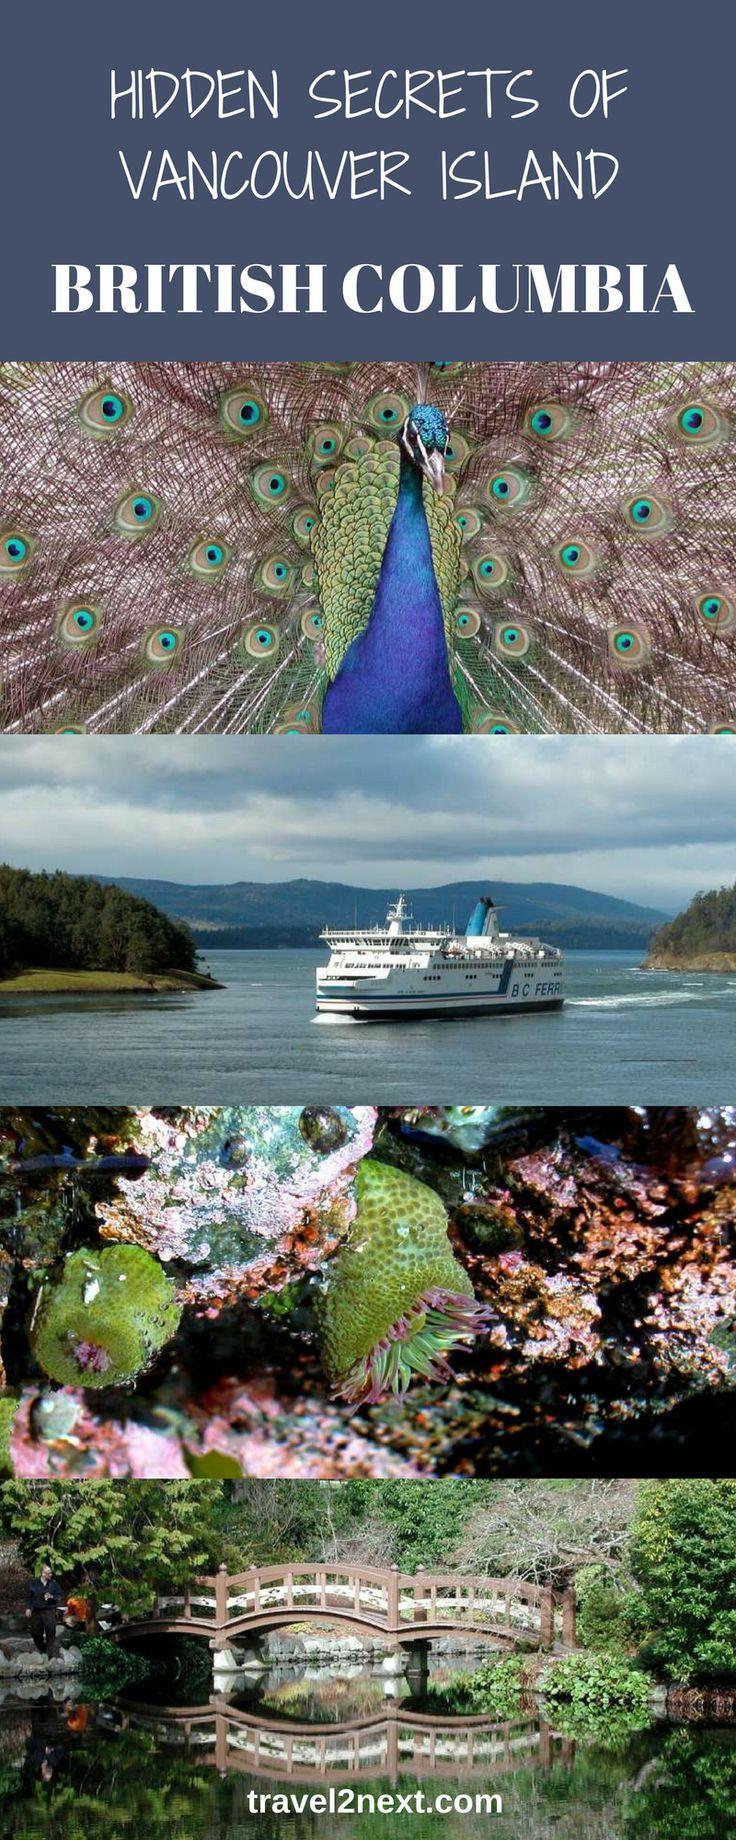 Hidden secrets of Vancouver Island, British Columbia, Canada.